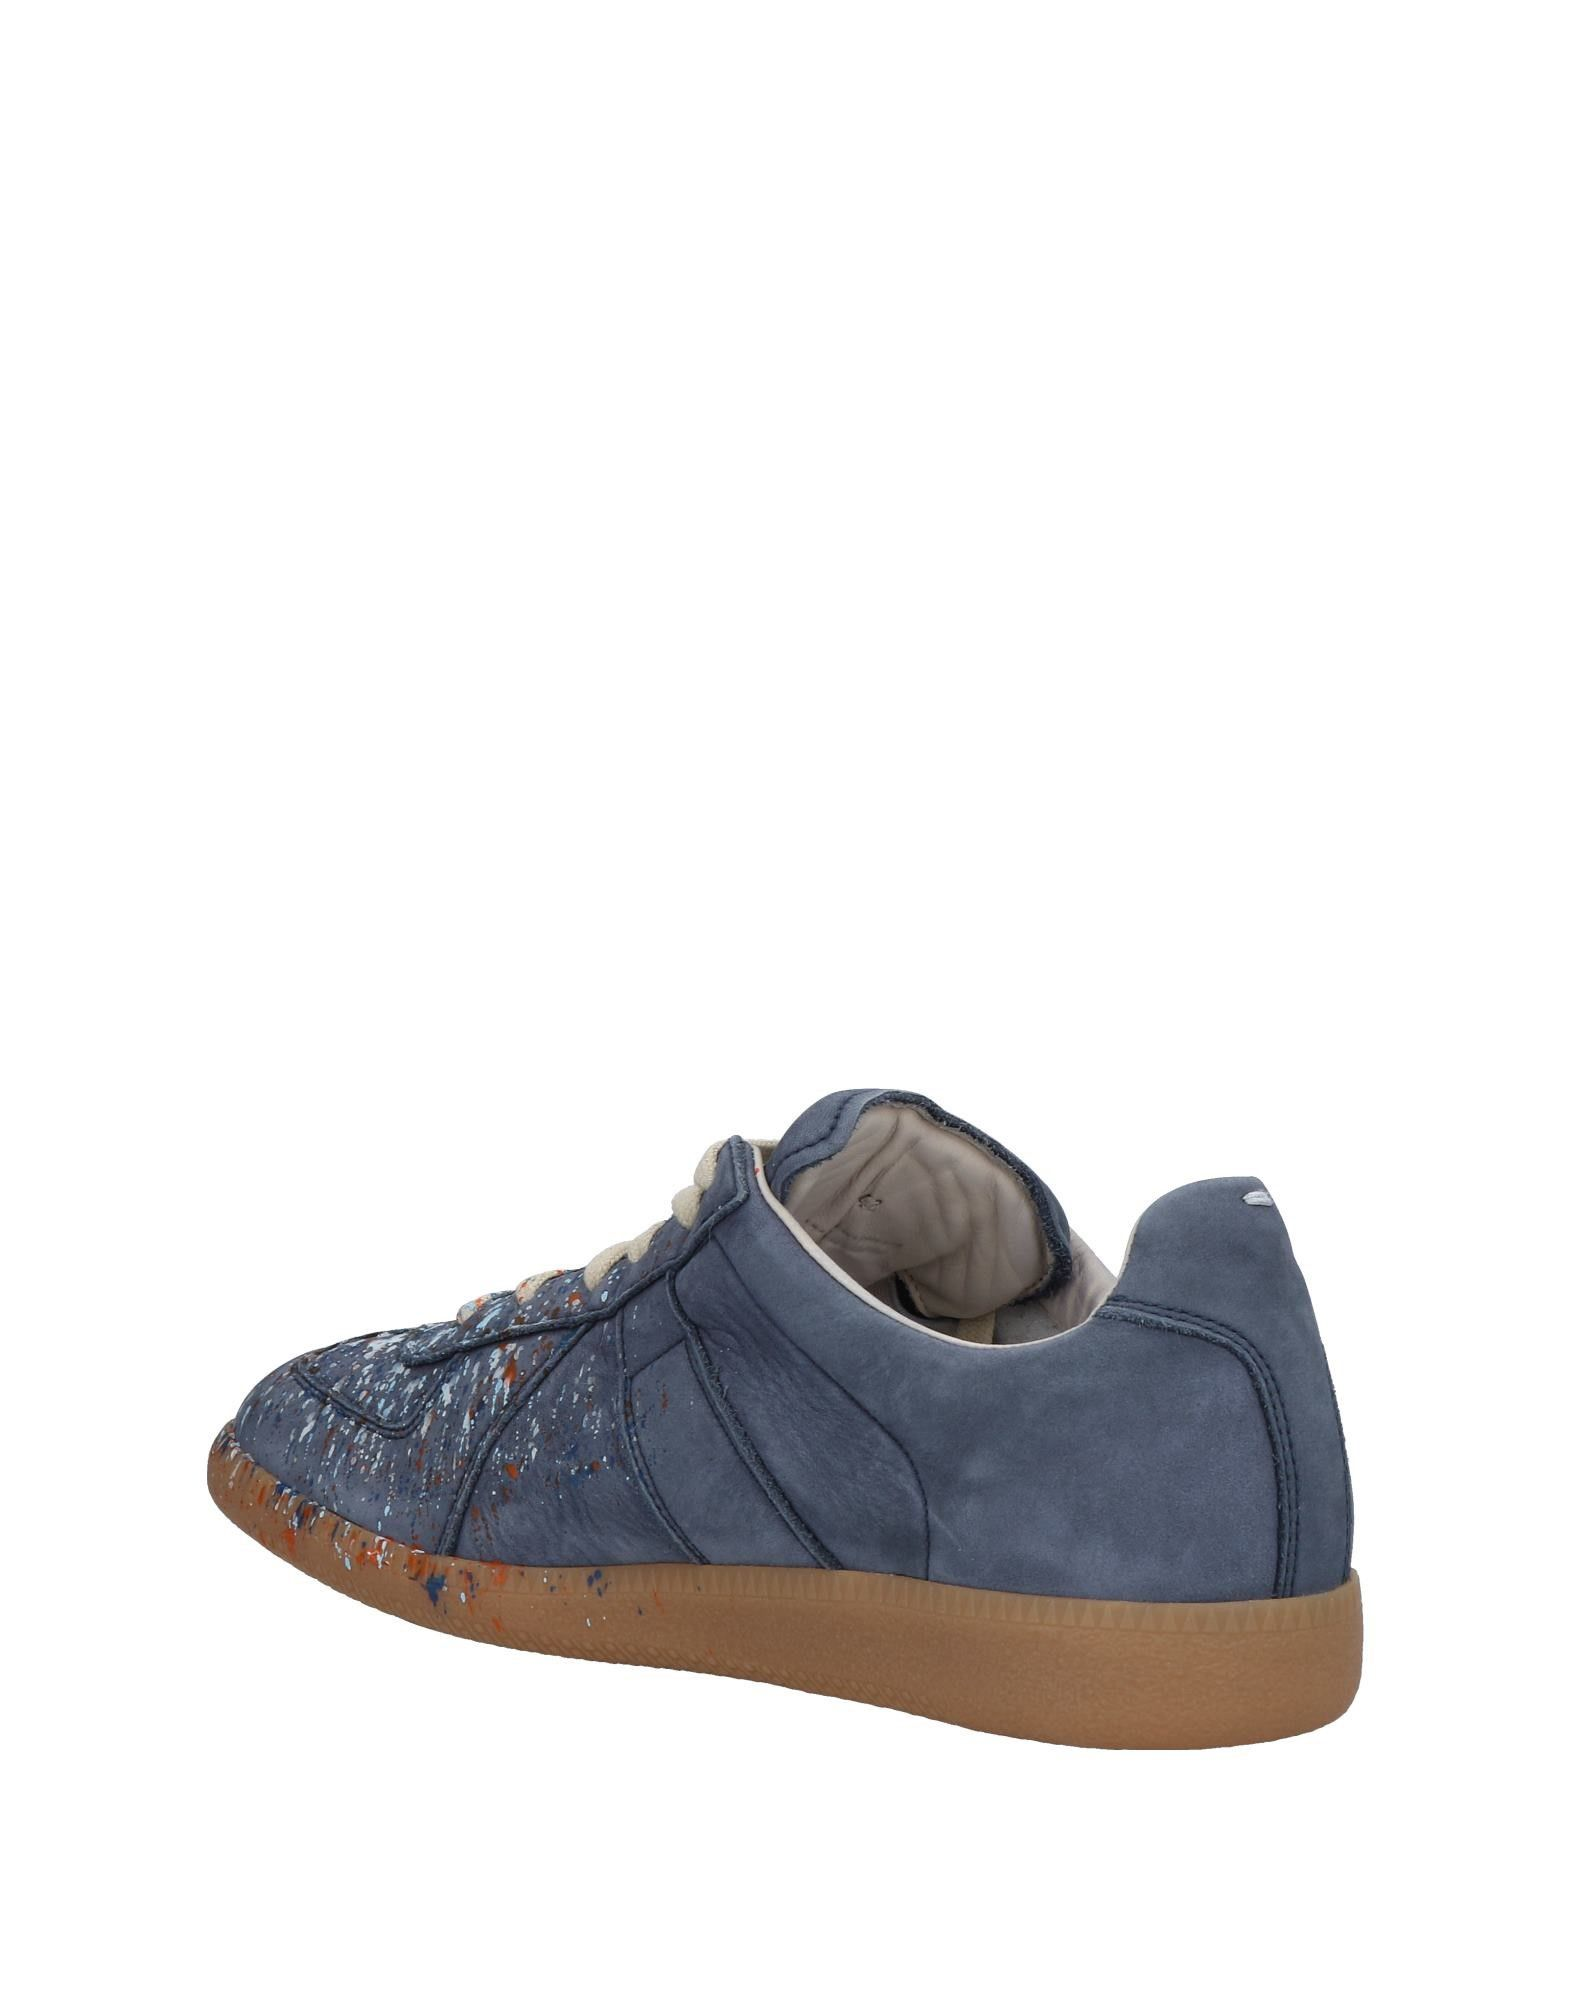 Maison Margiela Sneakers Herren  11471866DD Gute Gute Gute Qualität beliebte Schuhe d42dfa